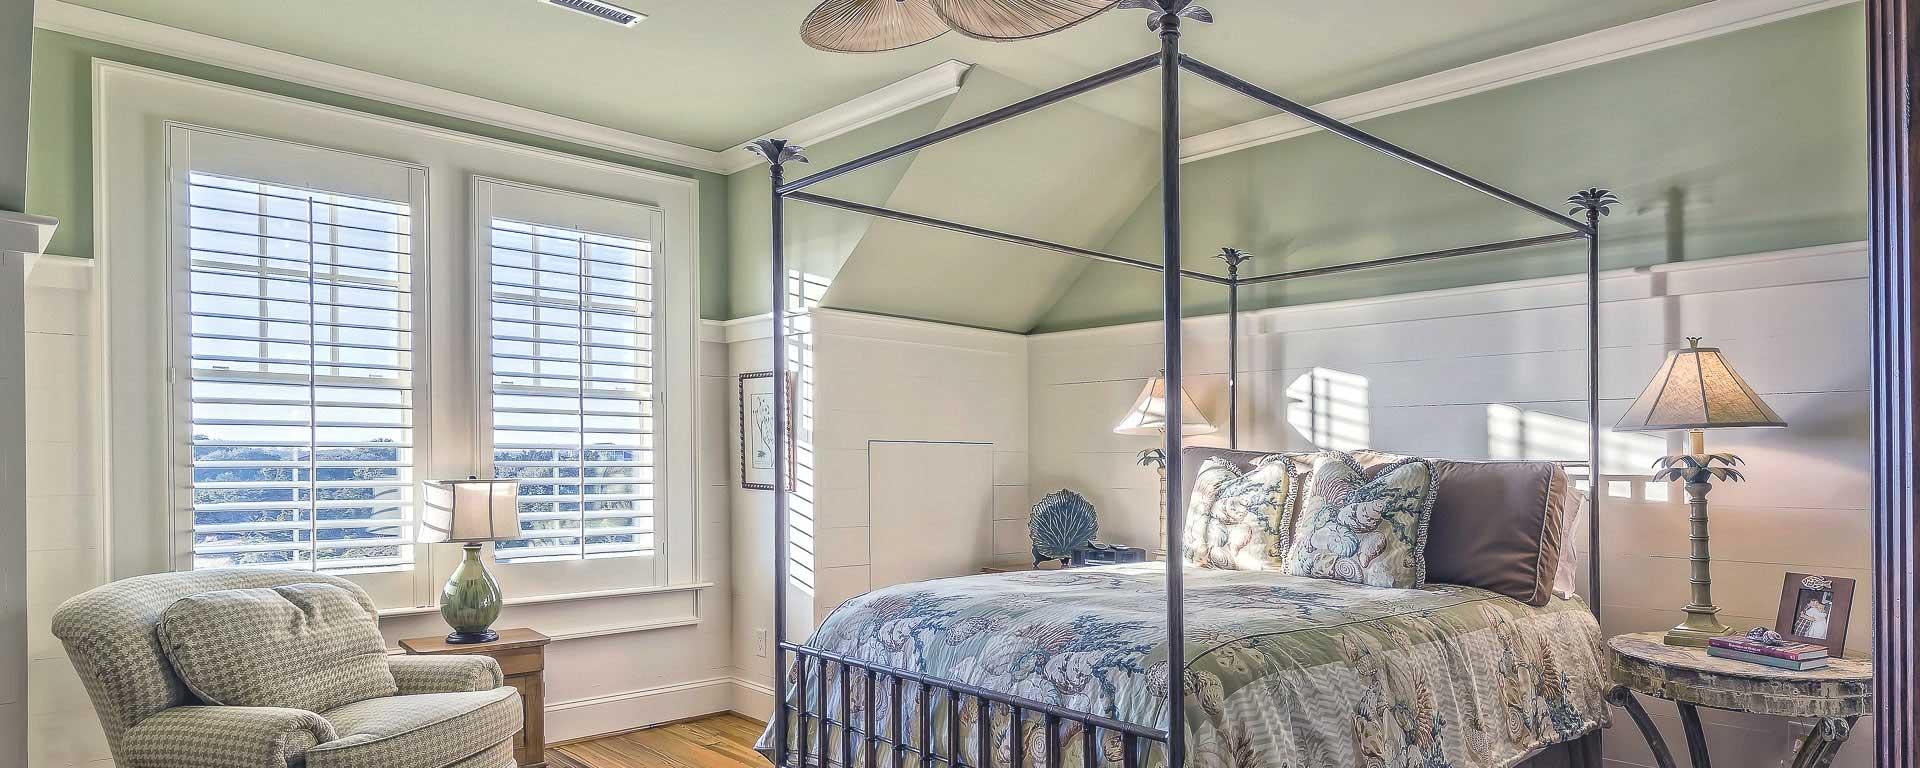 Дизайнерский ремонт 2-комнатной квартиры